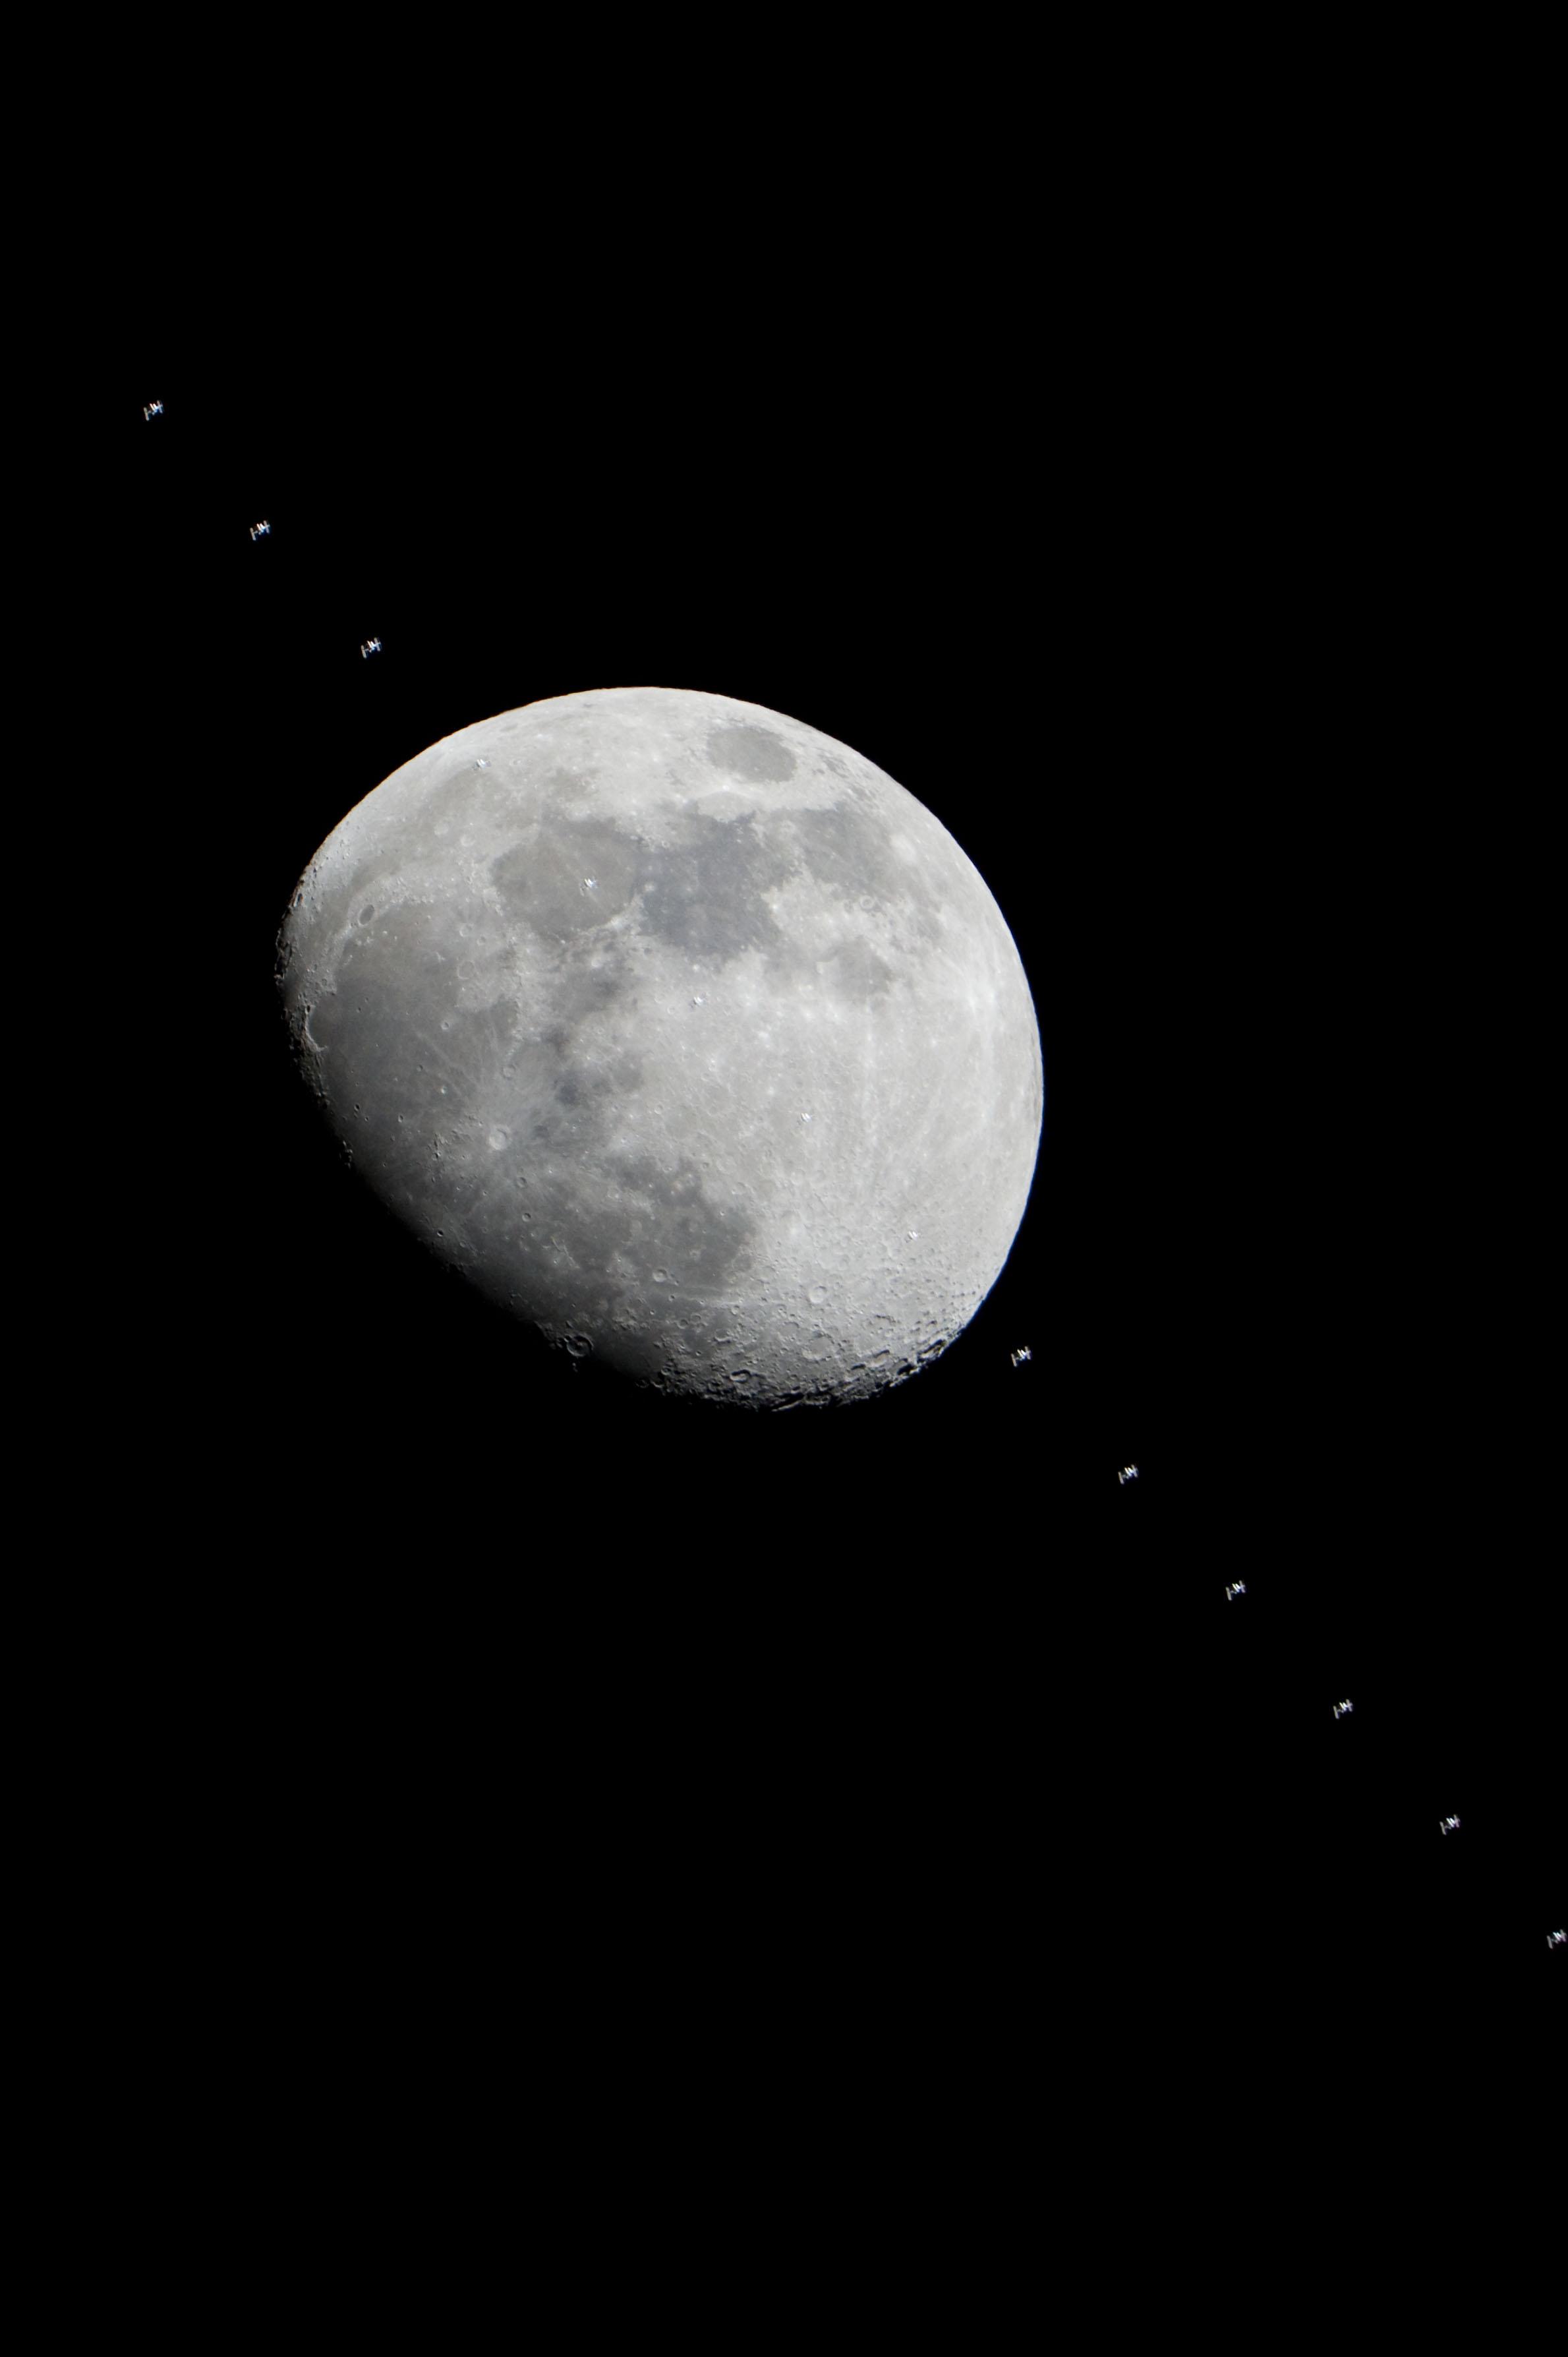 near space shuttle moon - photo #11